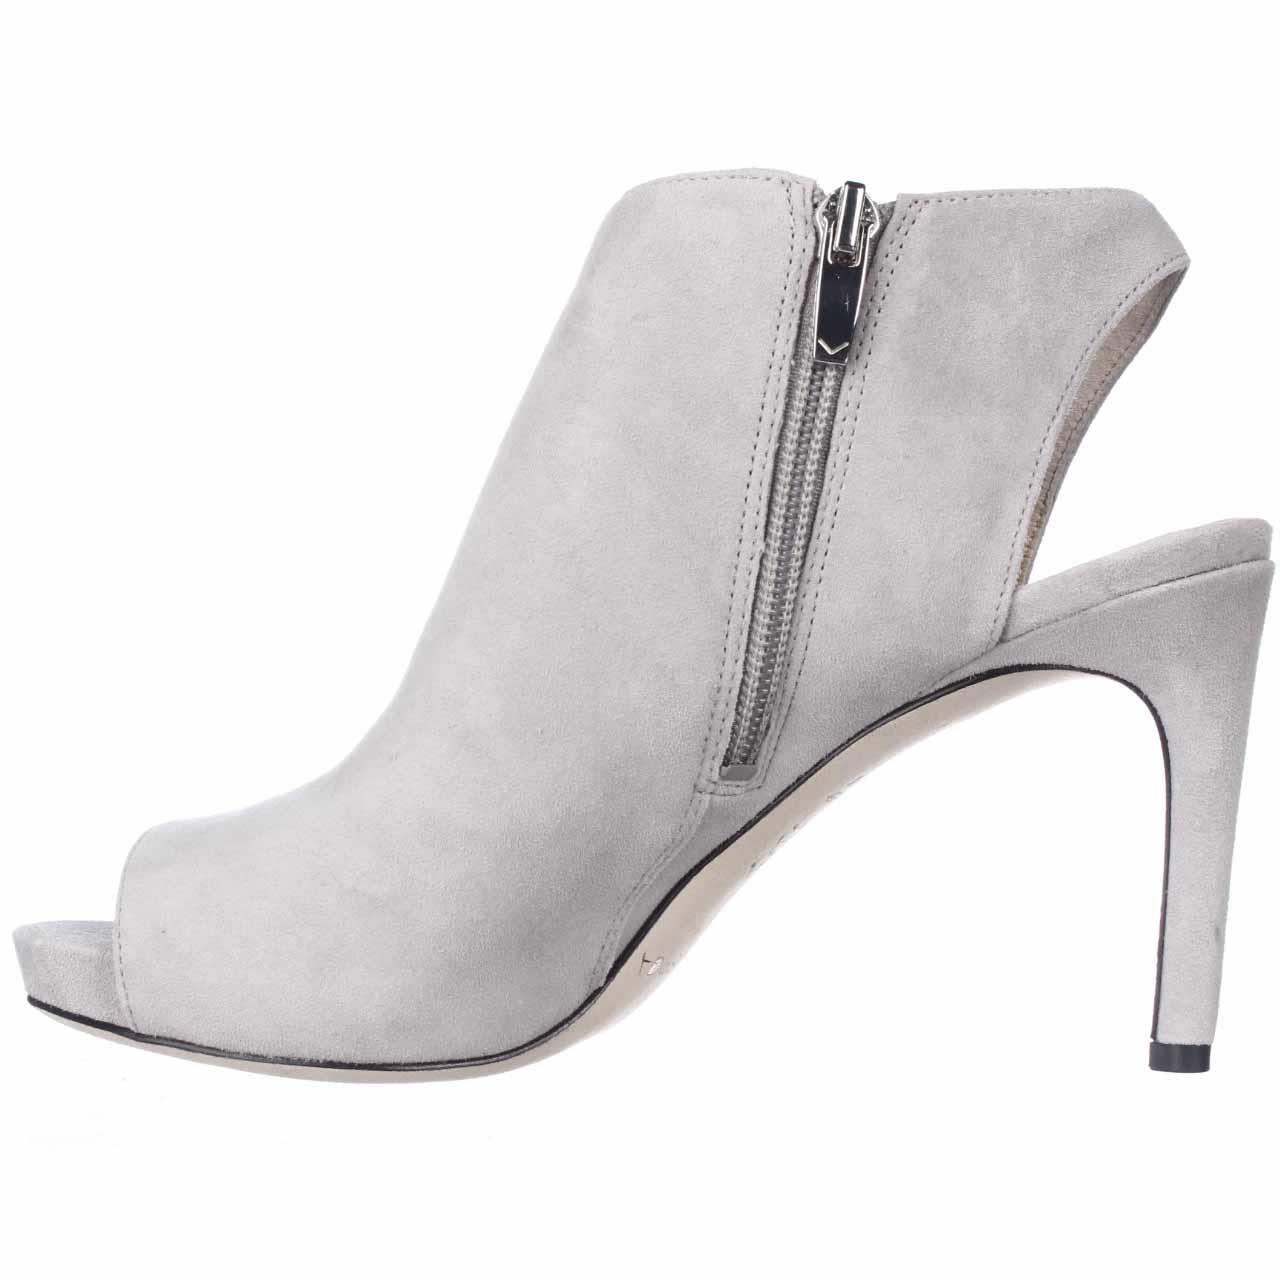 Via Spiga Nariah Peep Toe Heel Booties In Gray Lyst